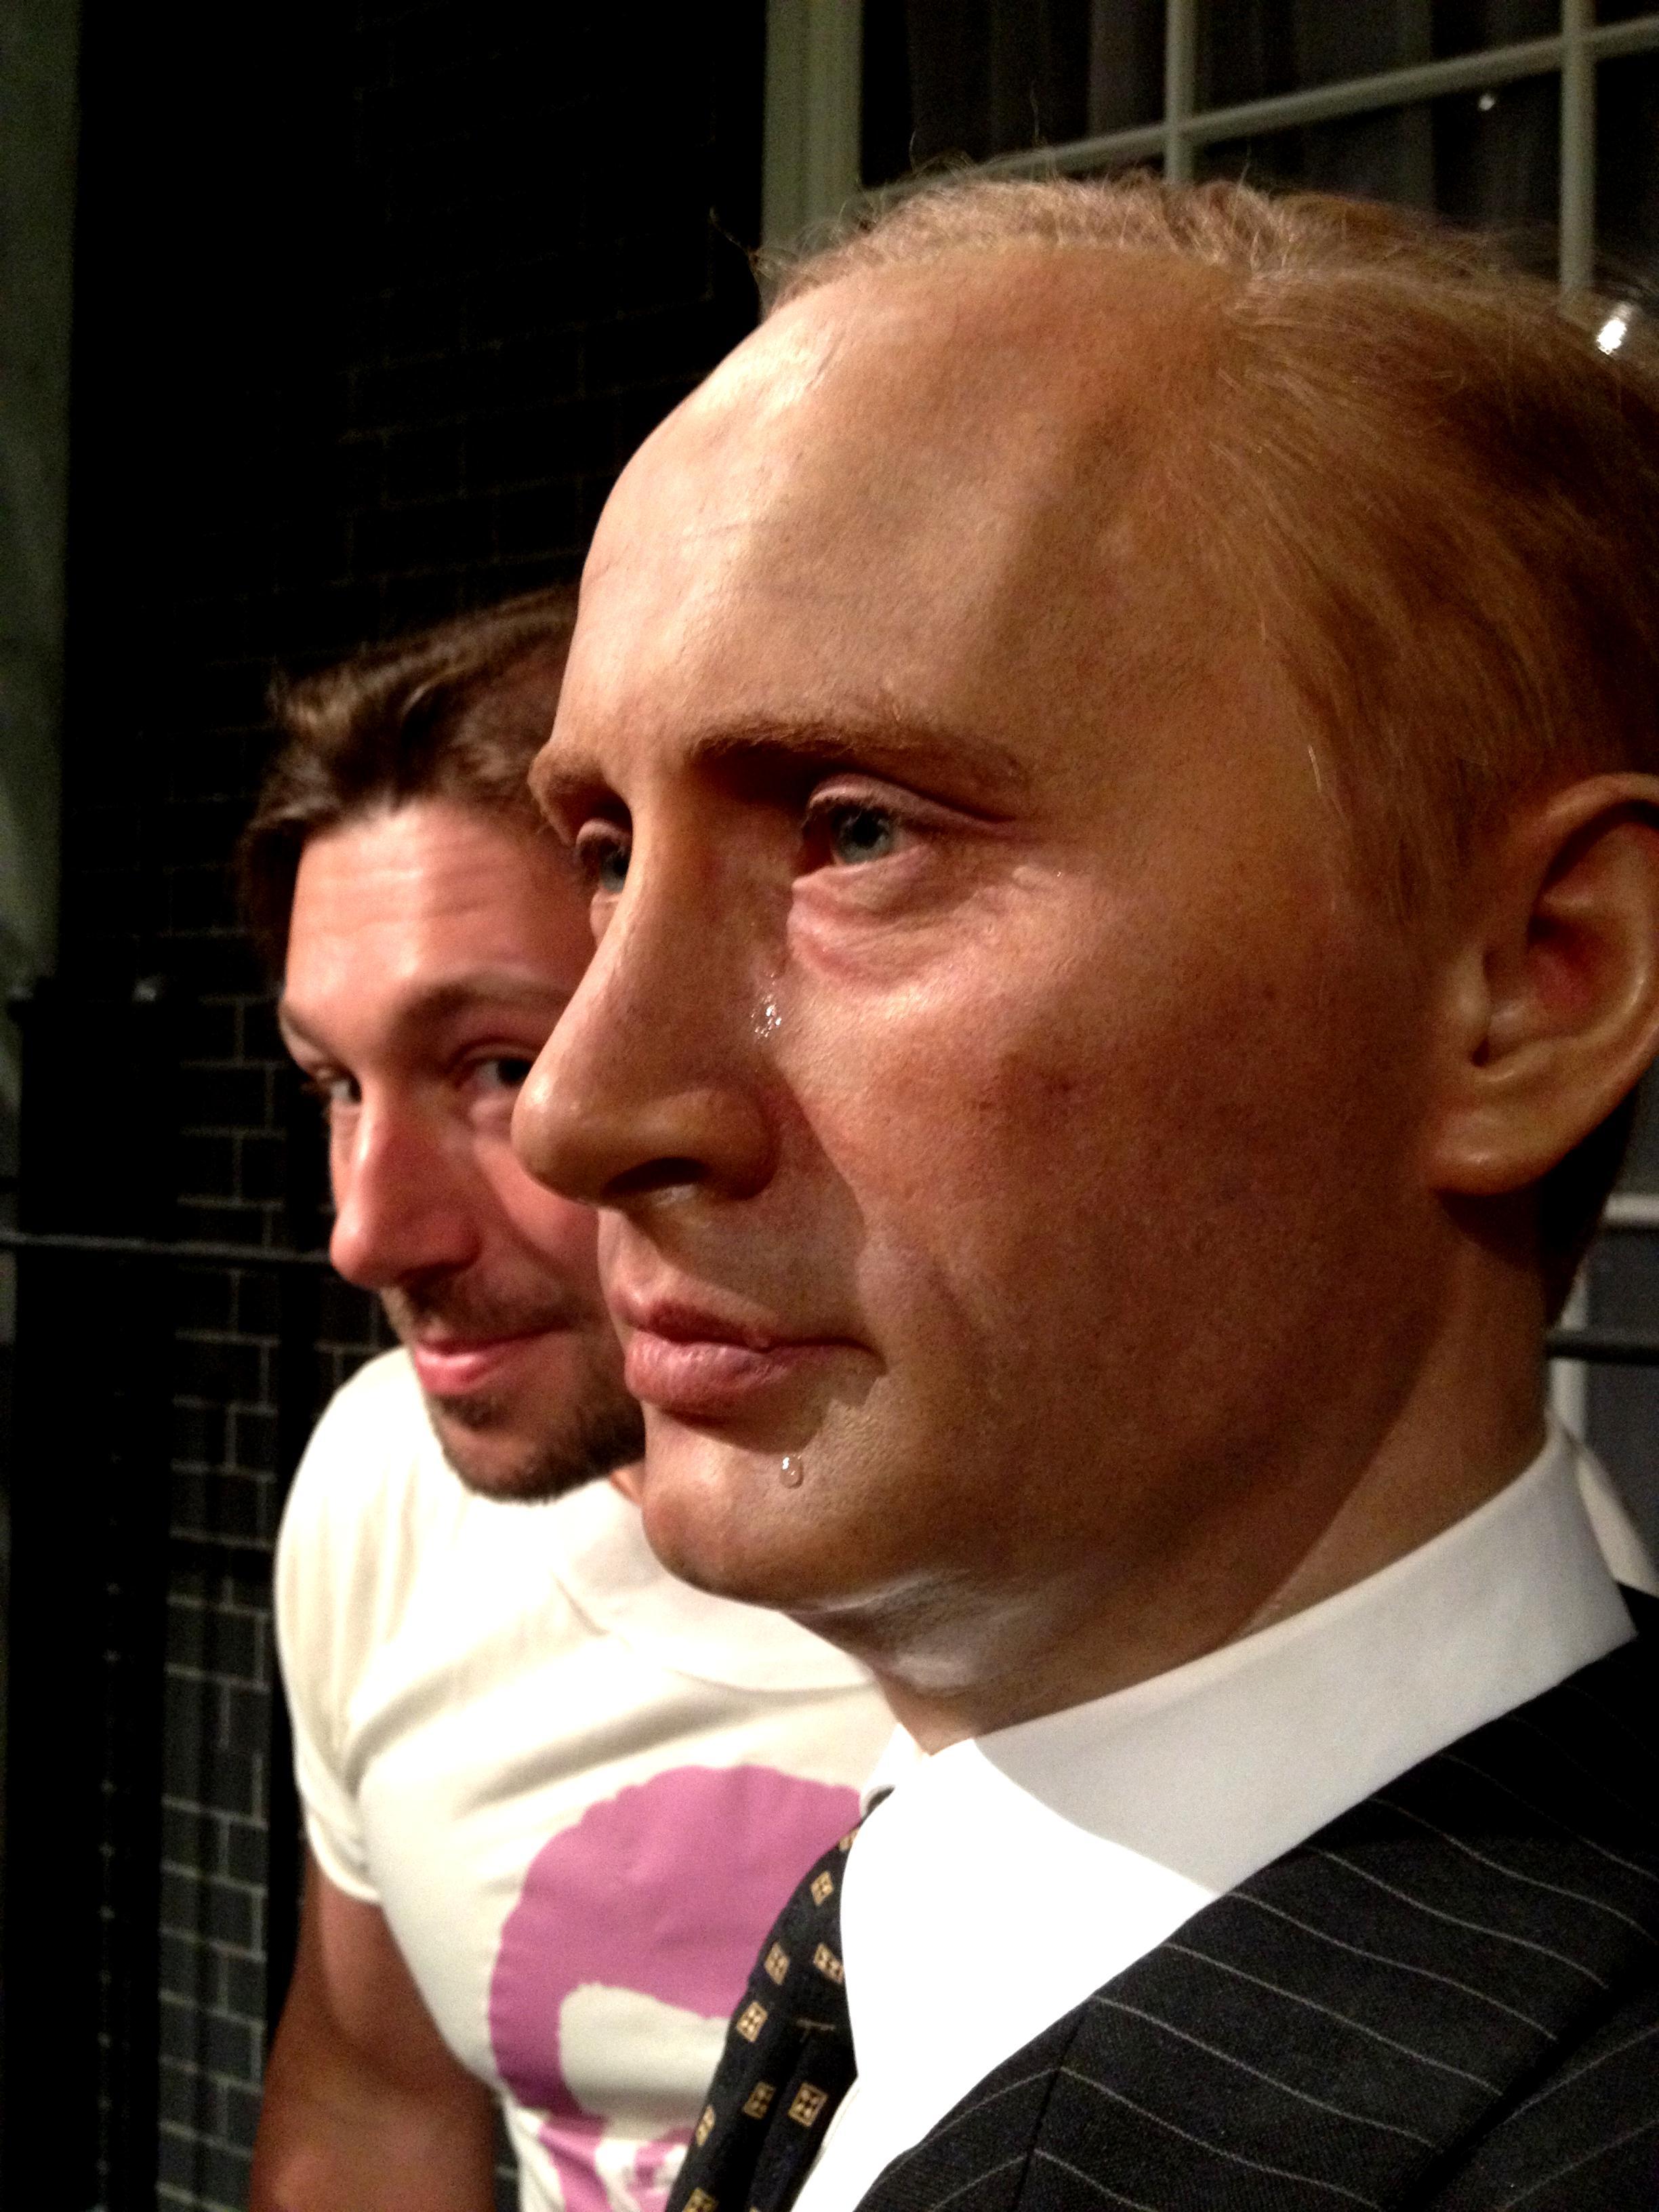 Аватар Путина демонстрирует чудеса мироточения: chich8 - photo#42